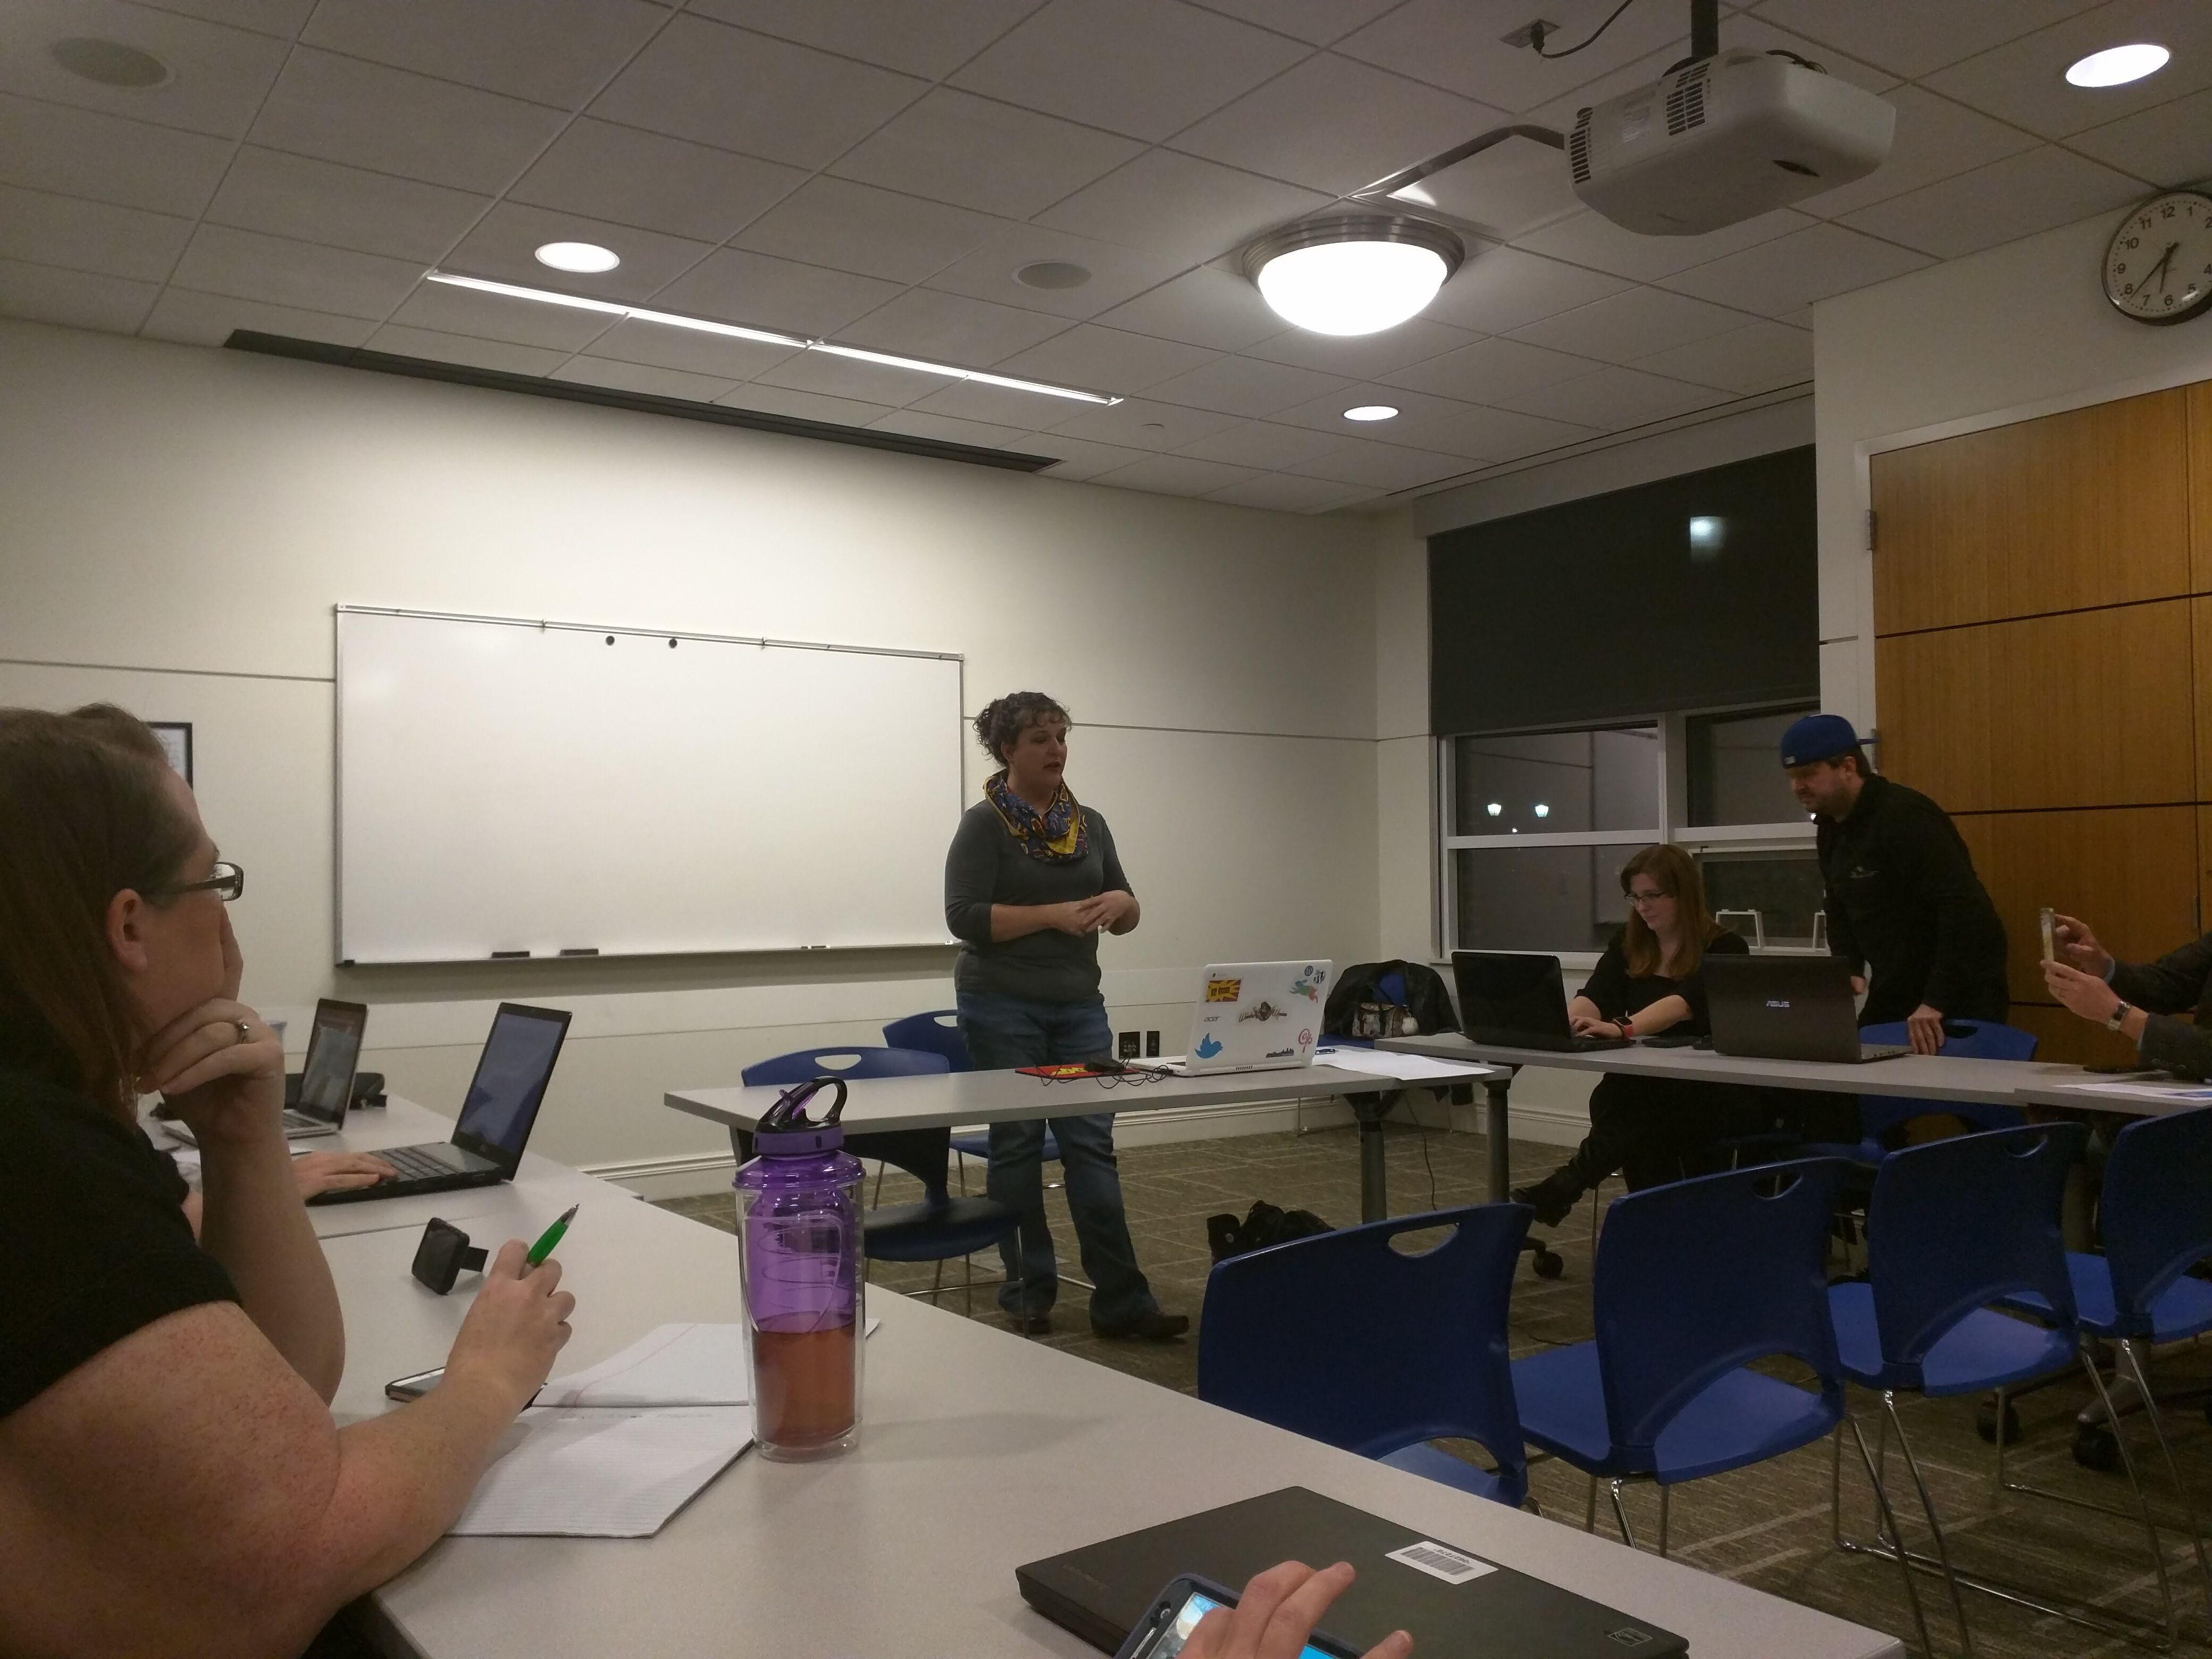 Photos - WordPressKC (Kansas City, MO) | Meetup